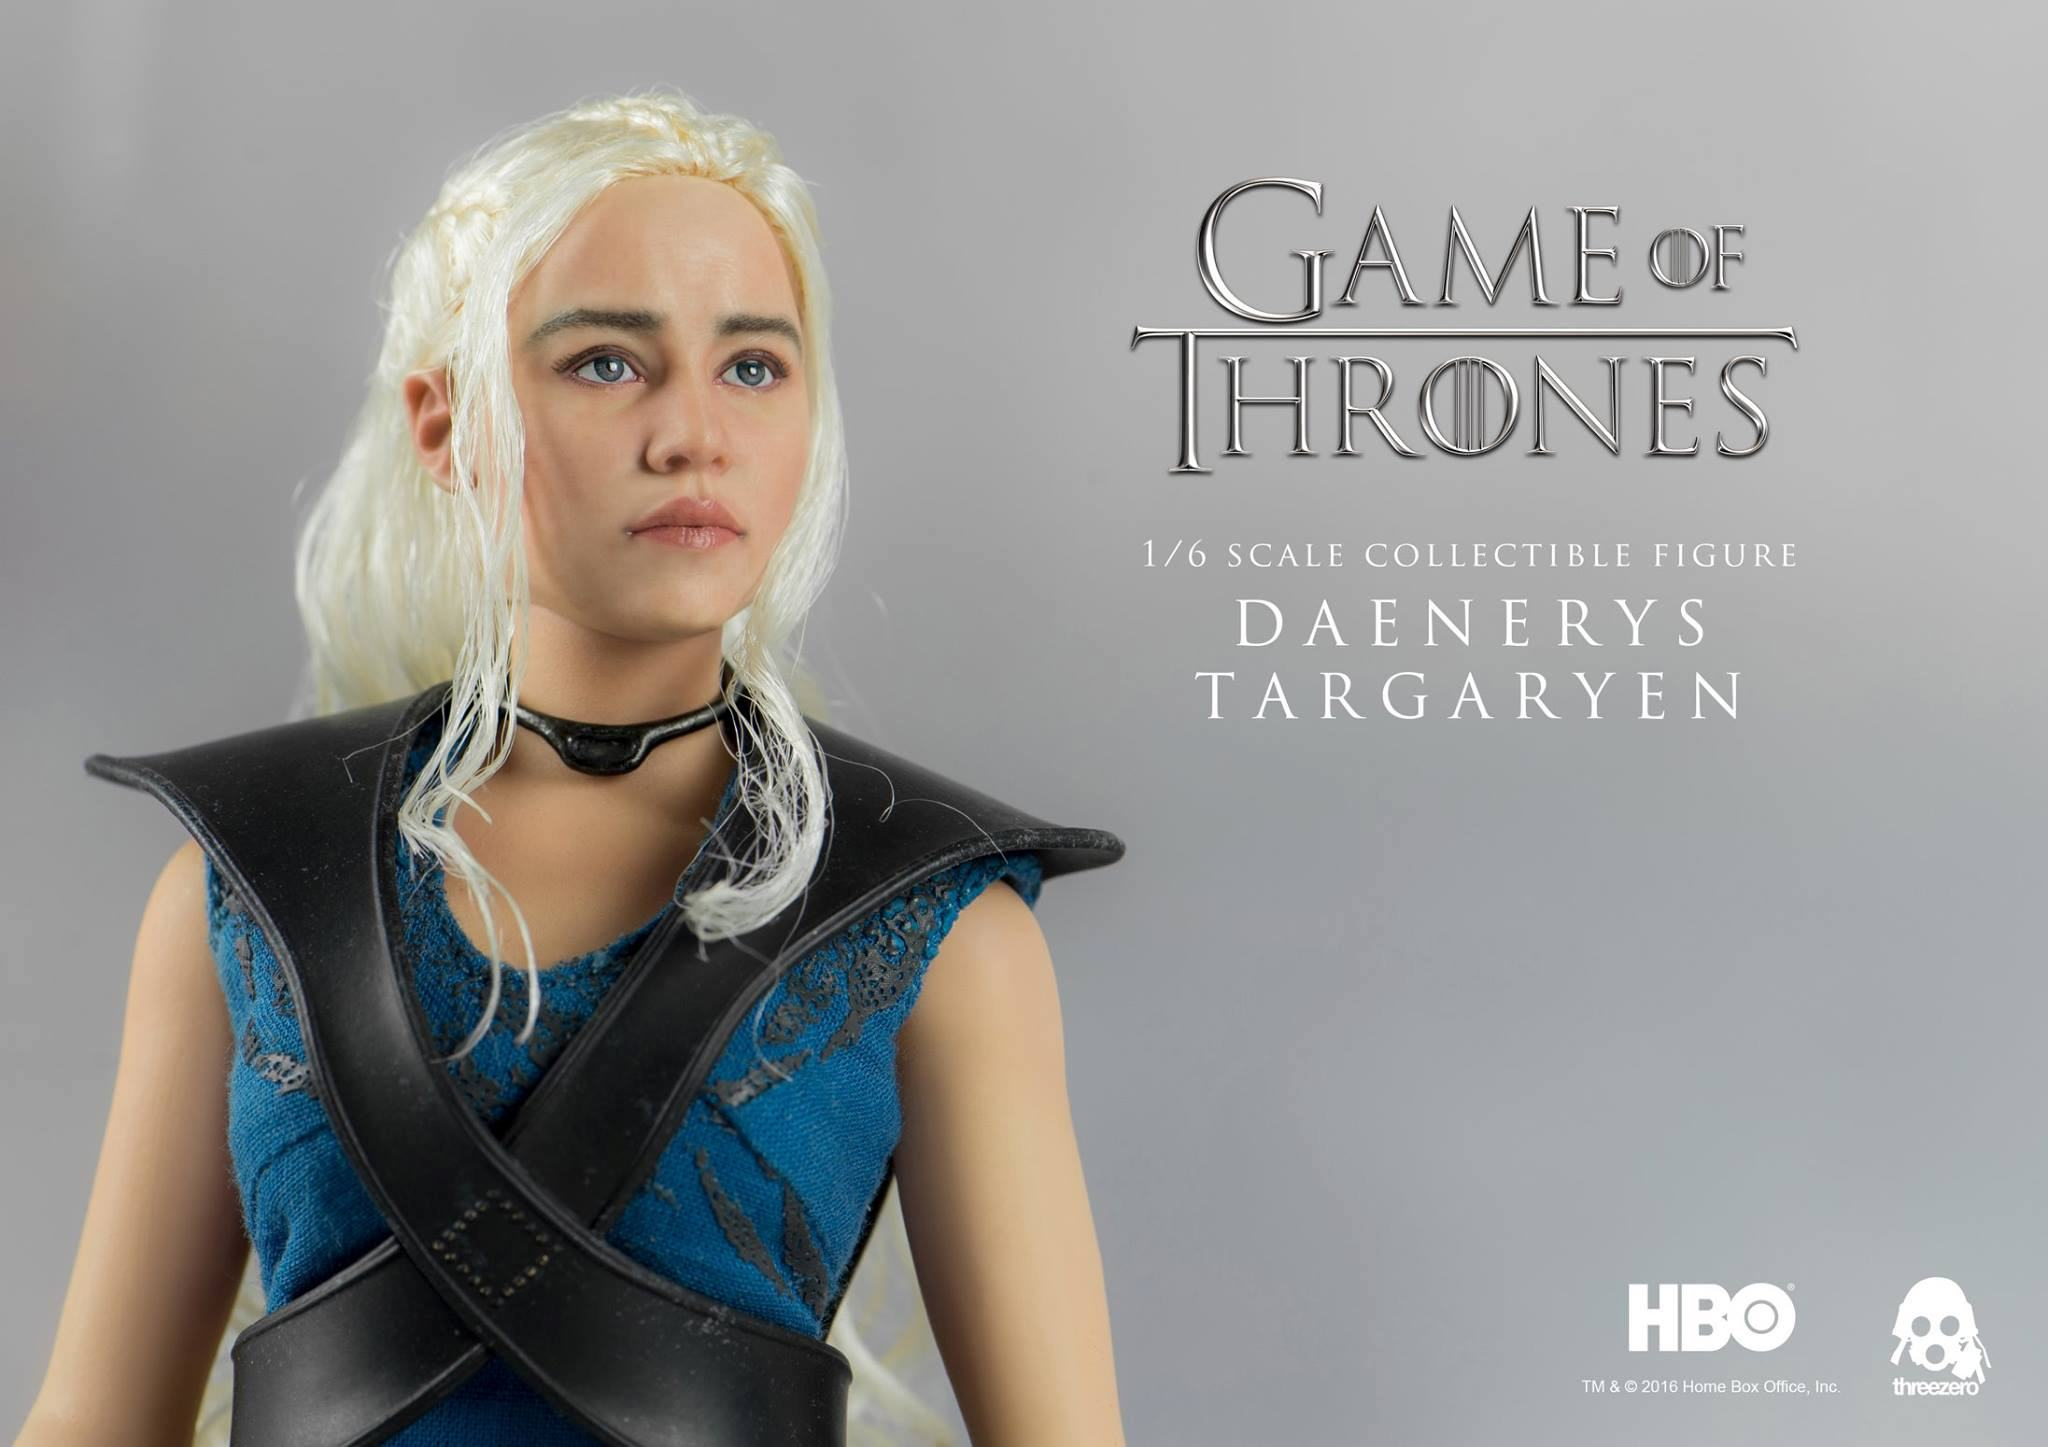 action-figure-perfeita-game-of-thrones-daenerys-targaryen-threezero-12